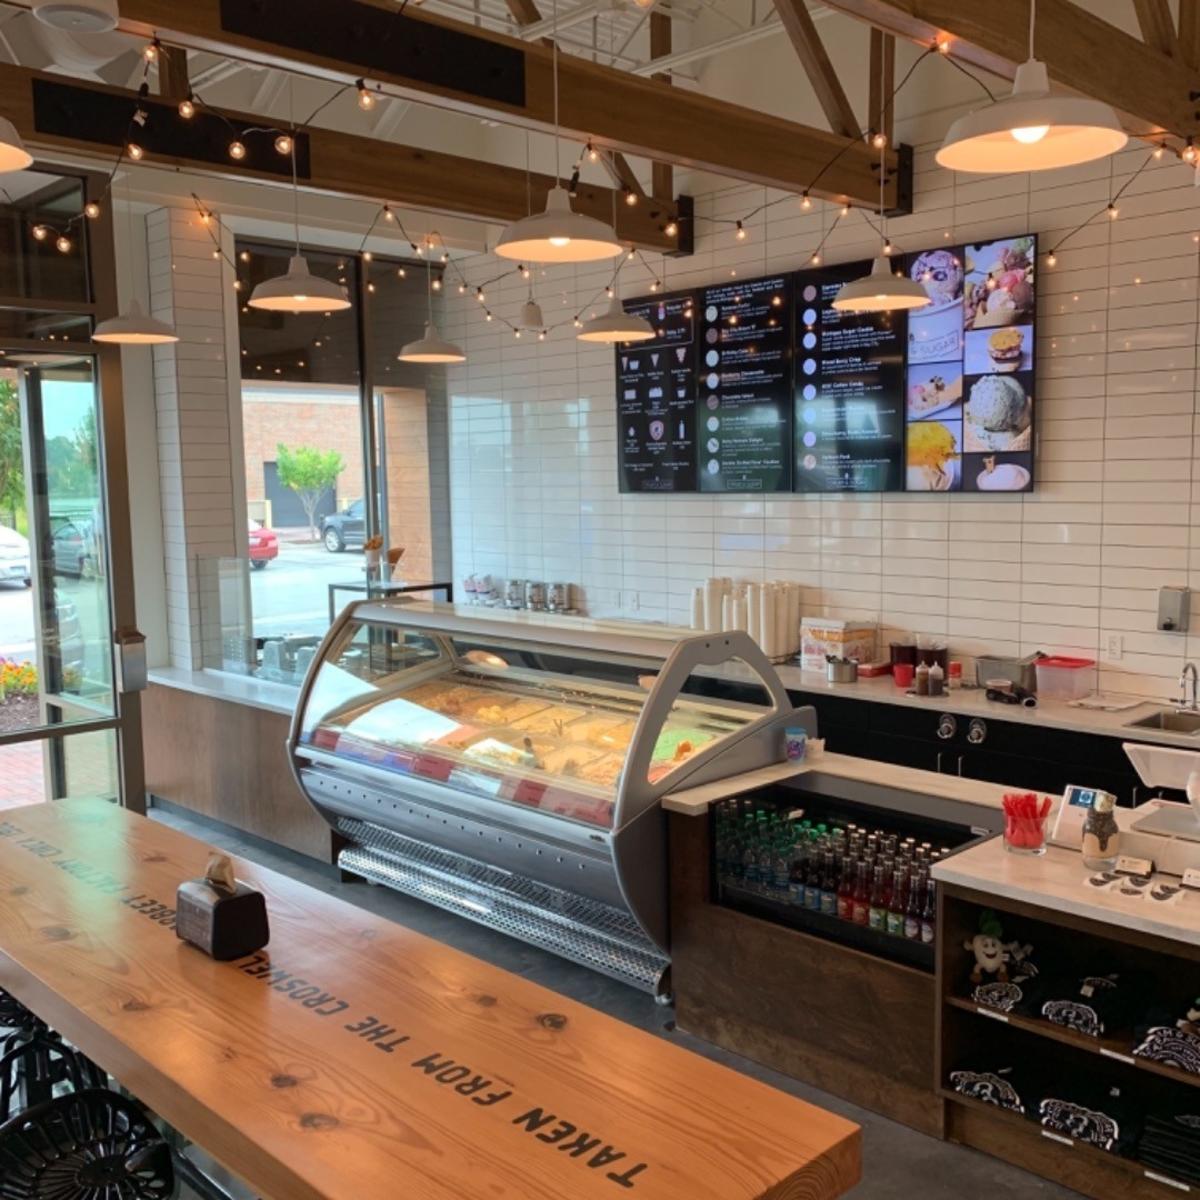 Ice cream displays at Cream & Sugar Ice Cream Company in Uptown Bay City